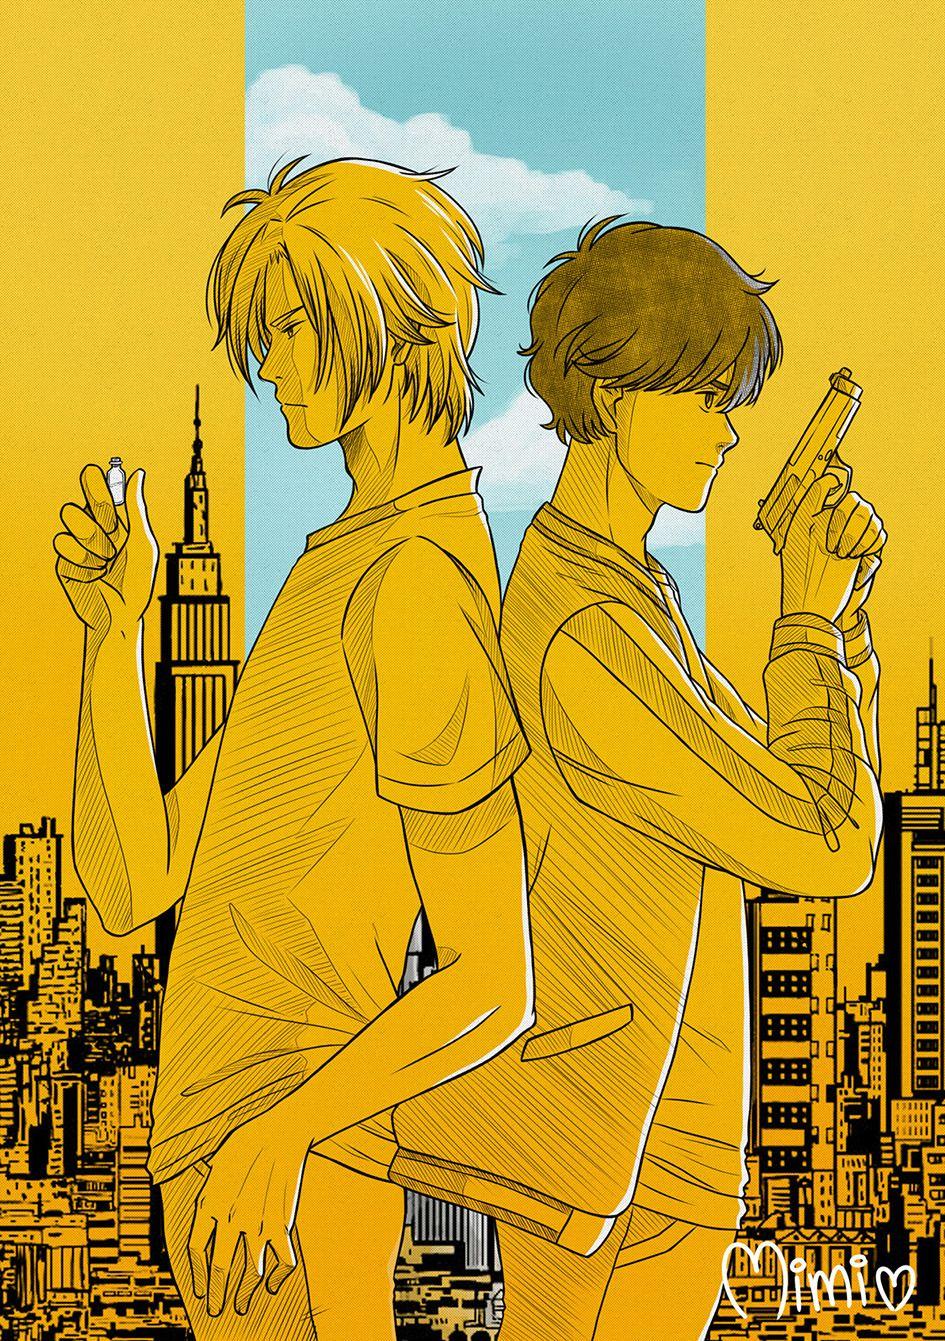 Pin By Shin On Banana Fish Manga Covers Fish Anime Wallpaper